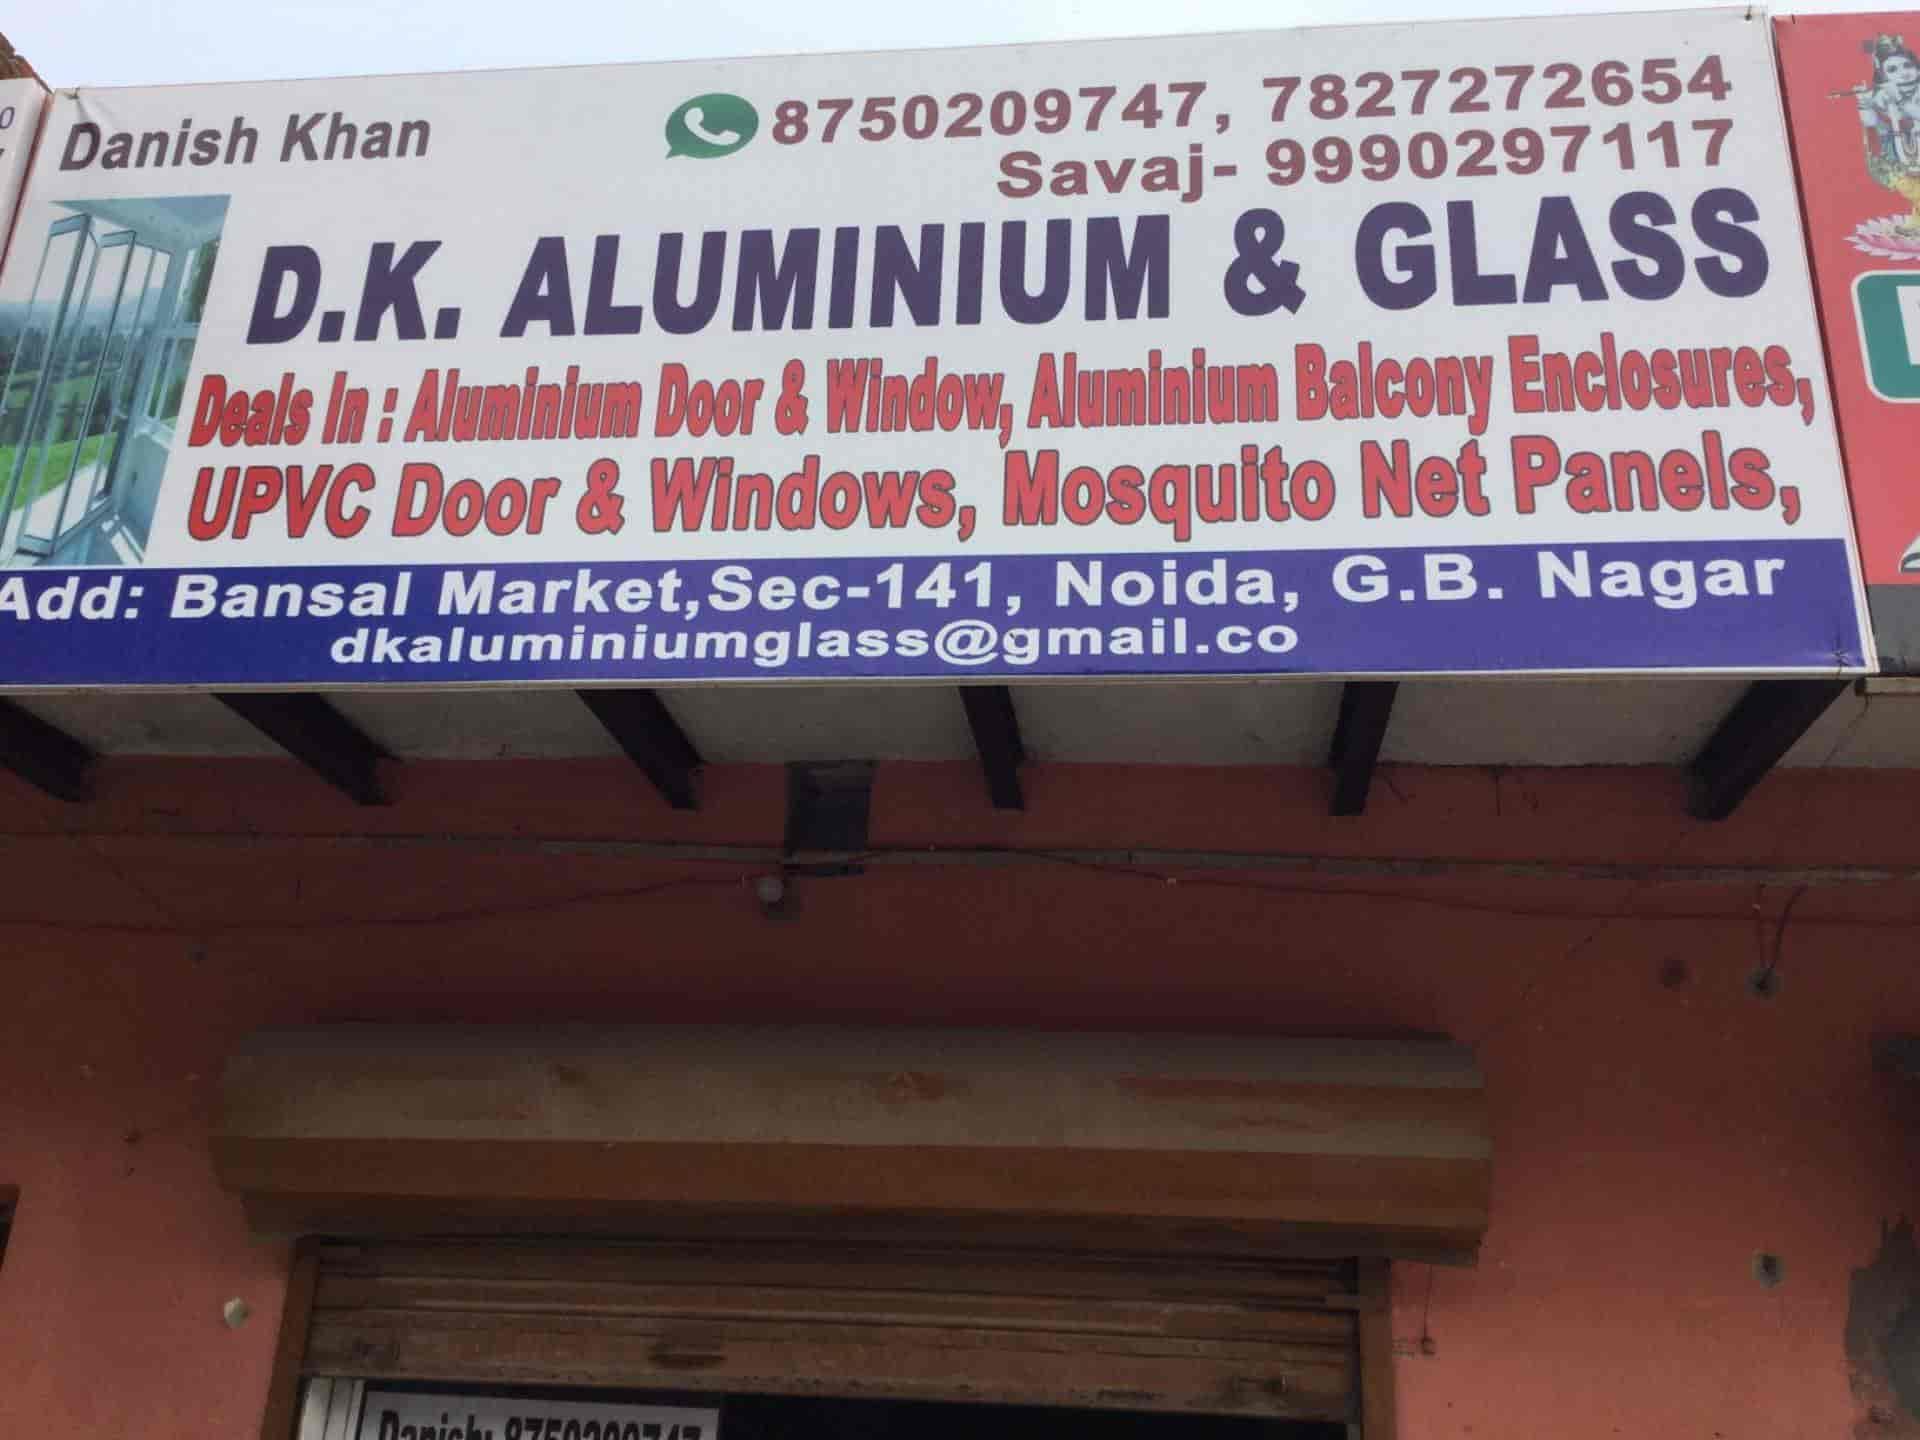 Dk Aluminium Glass Photos, Sector 141, Noida- Pictures & Images